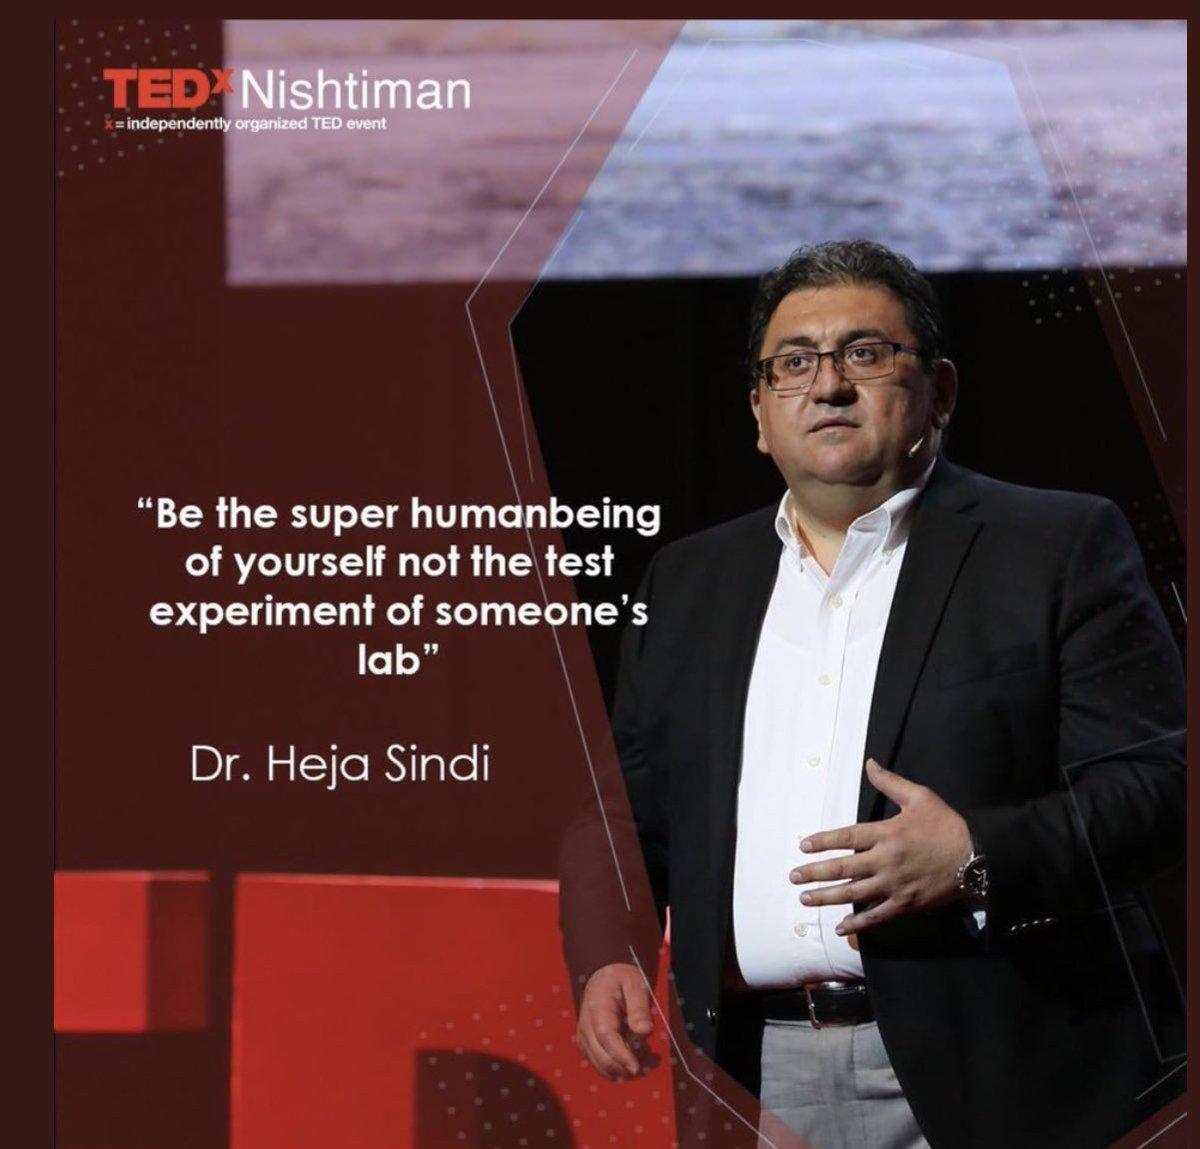 My fav profissor Dr.@HejaSindi today at @TEDxNishtiman stage gave his very inspirational speech.  #TEDxNishtiman2019 #TEDxNishtiman <br>http://pic.twitter.com/zNNQoQZez7